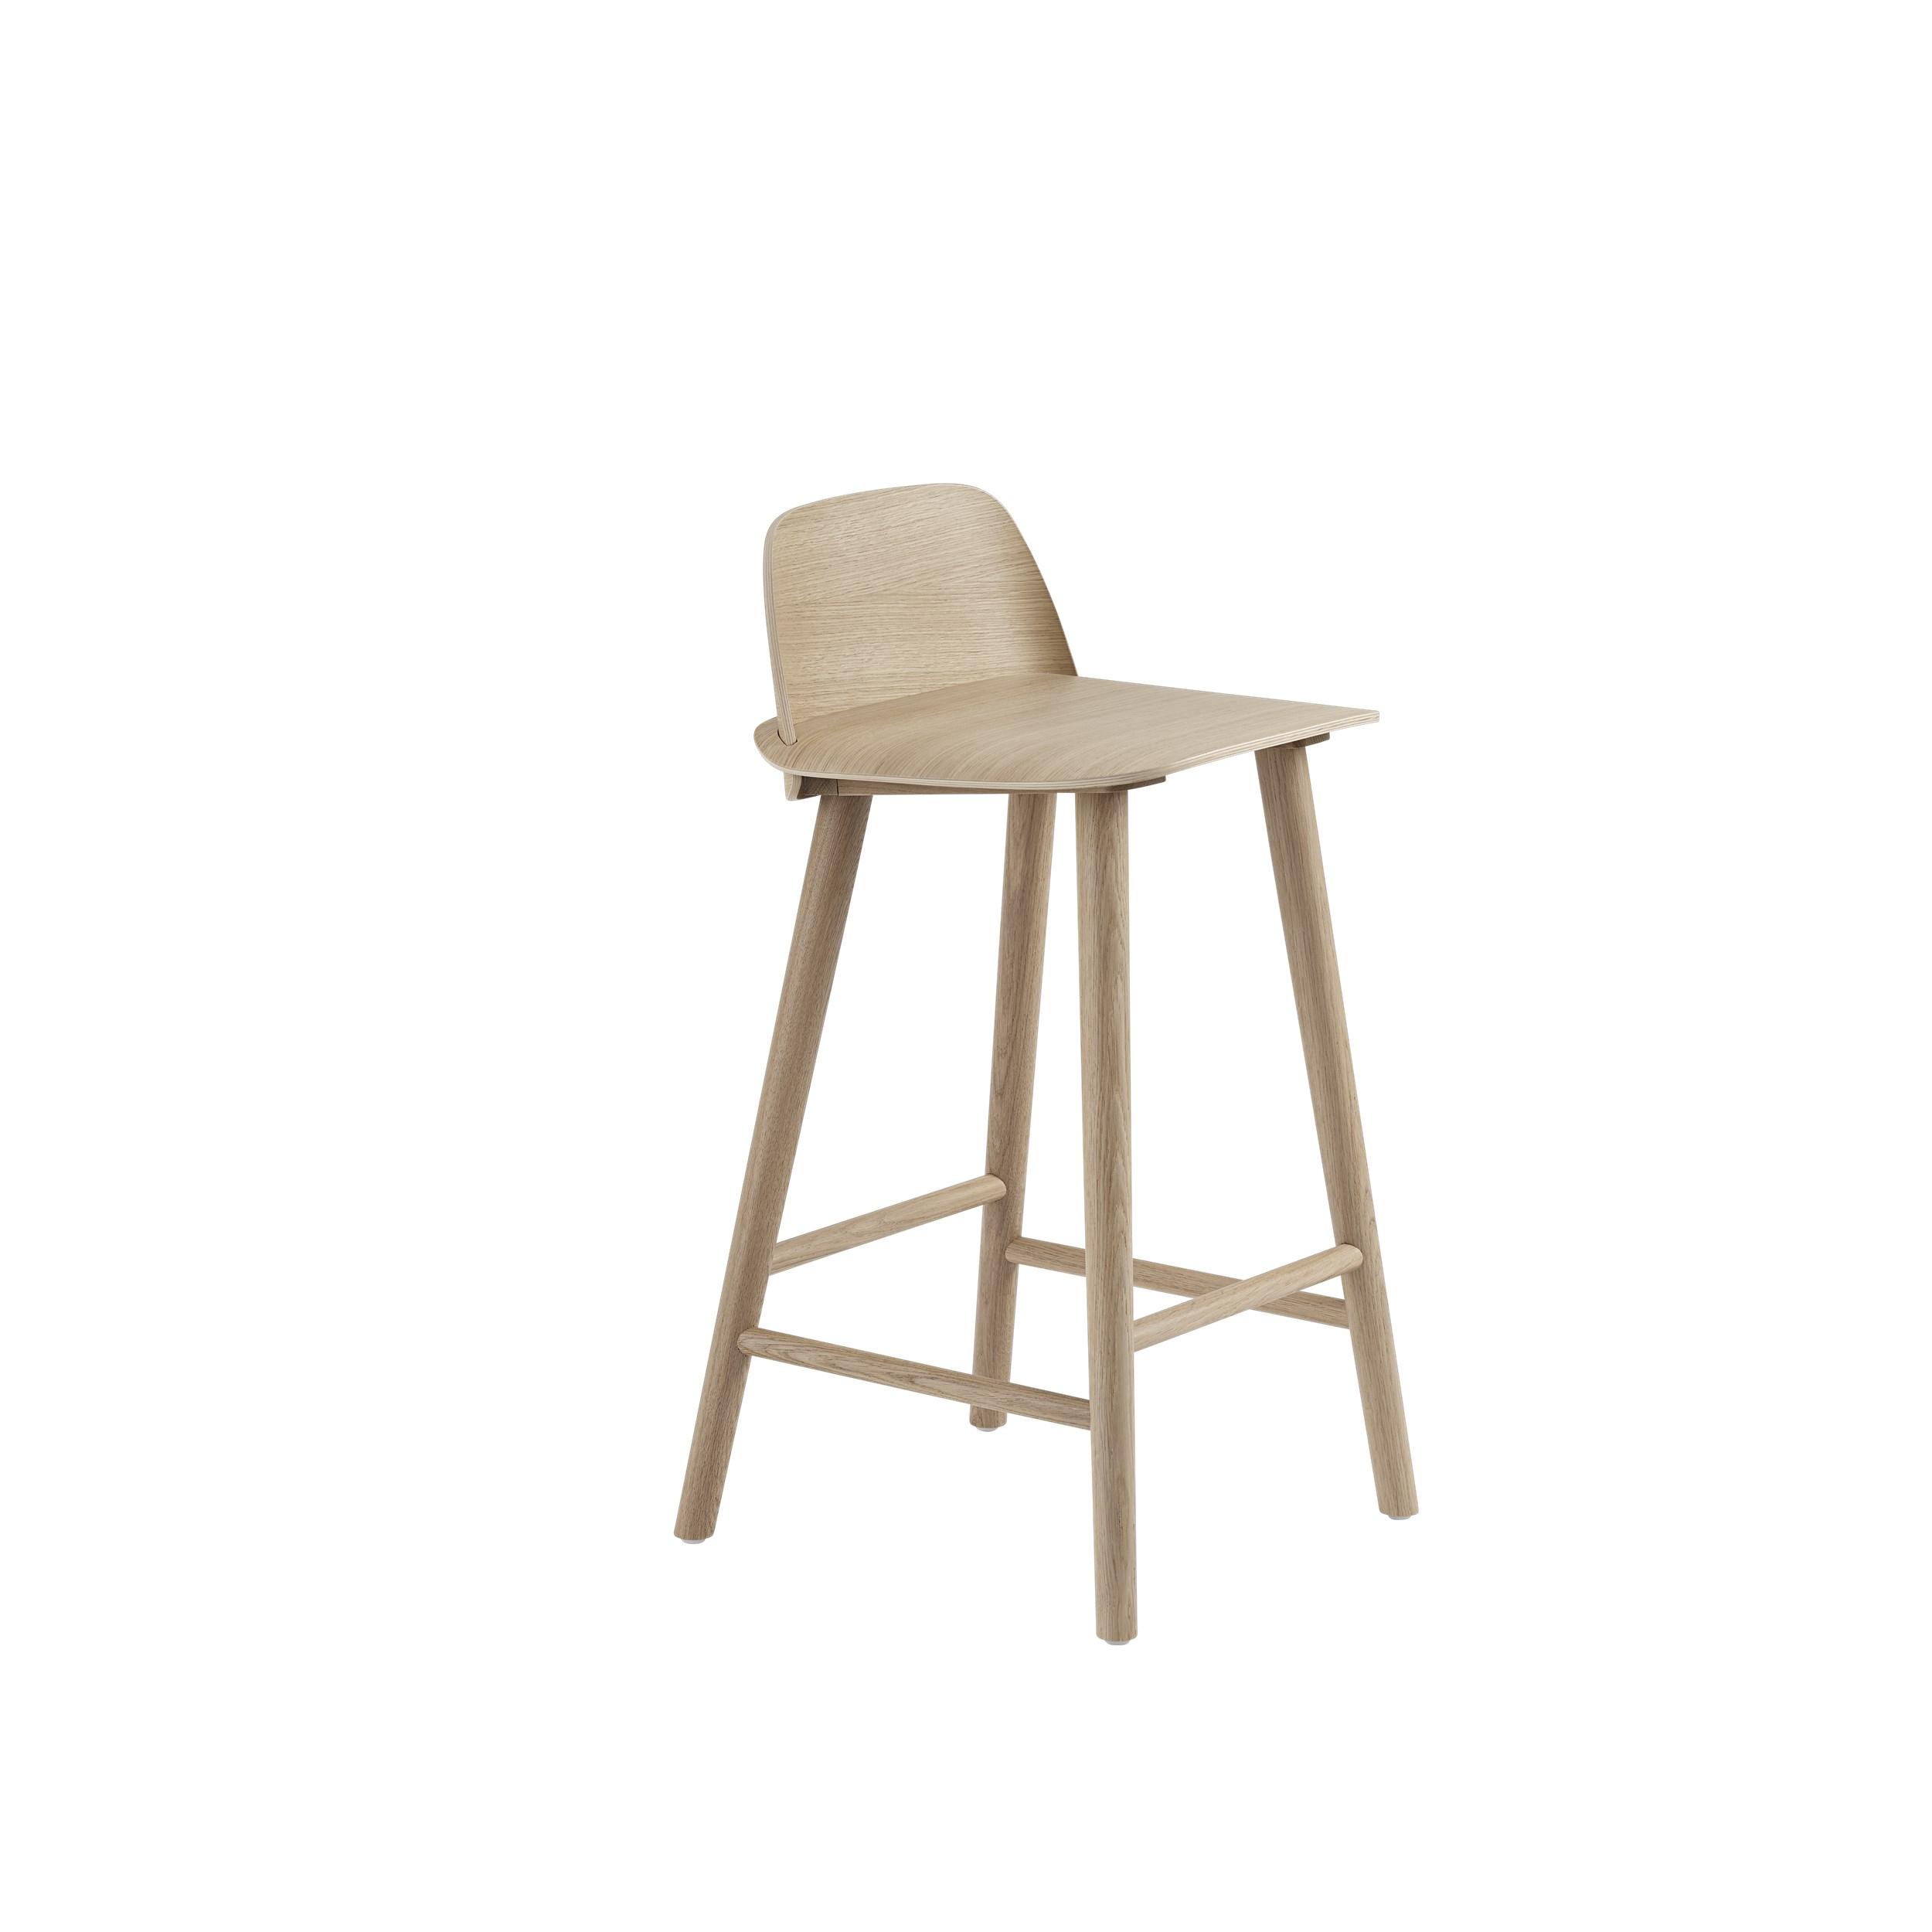 Nerd Bar stool Low